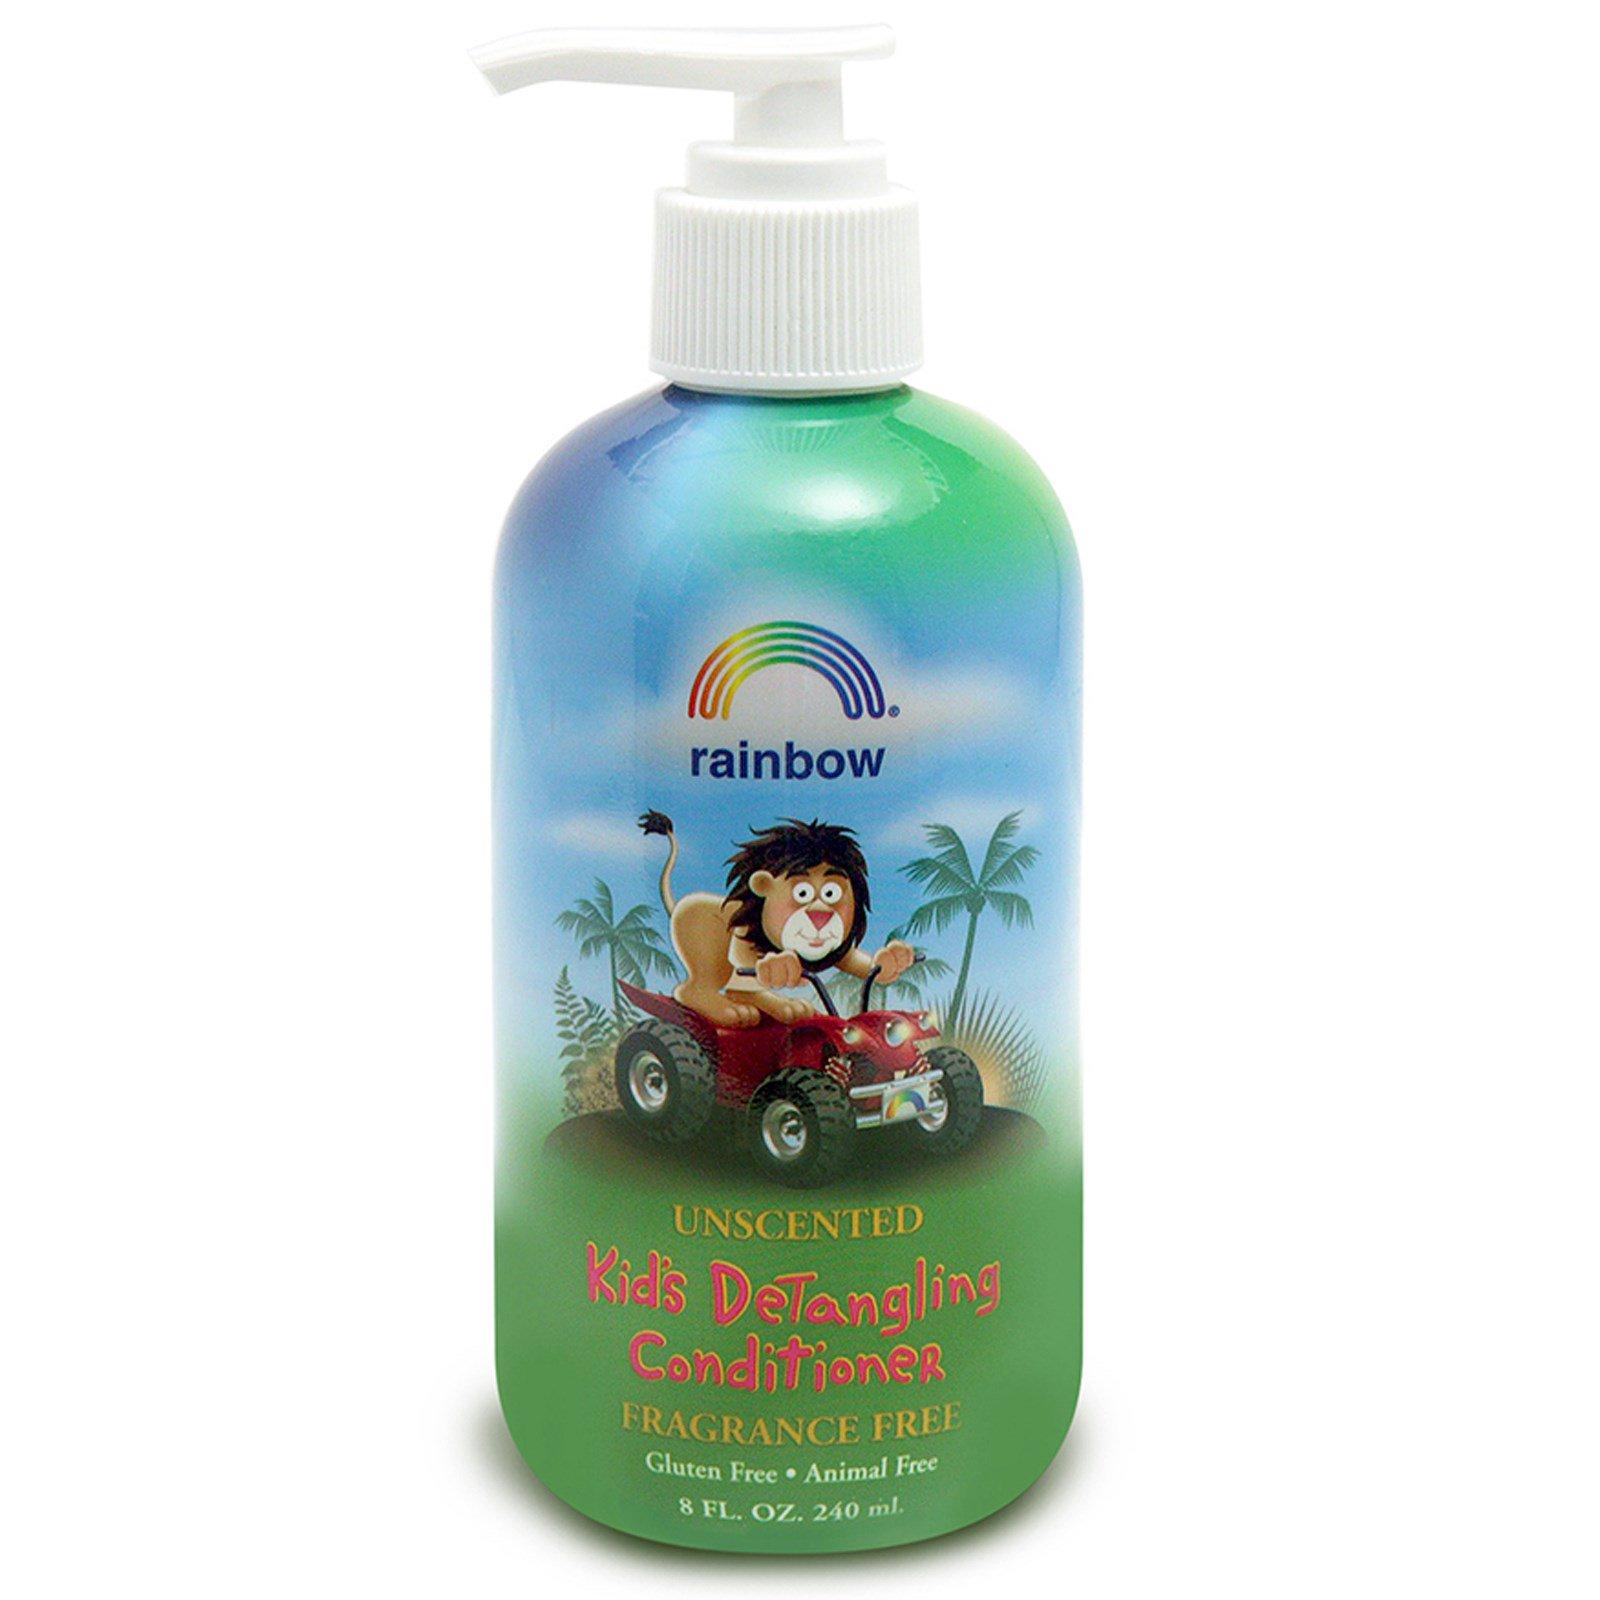 Rainbow Research Kids Detangling Conditioner Fragrance Free 8 Fl The Wet Brush Moroccan Detangler Powder Blue Oz 240